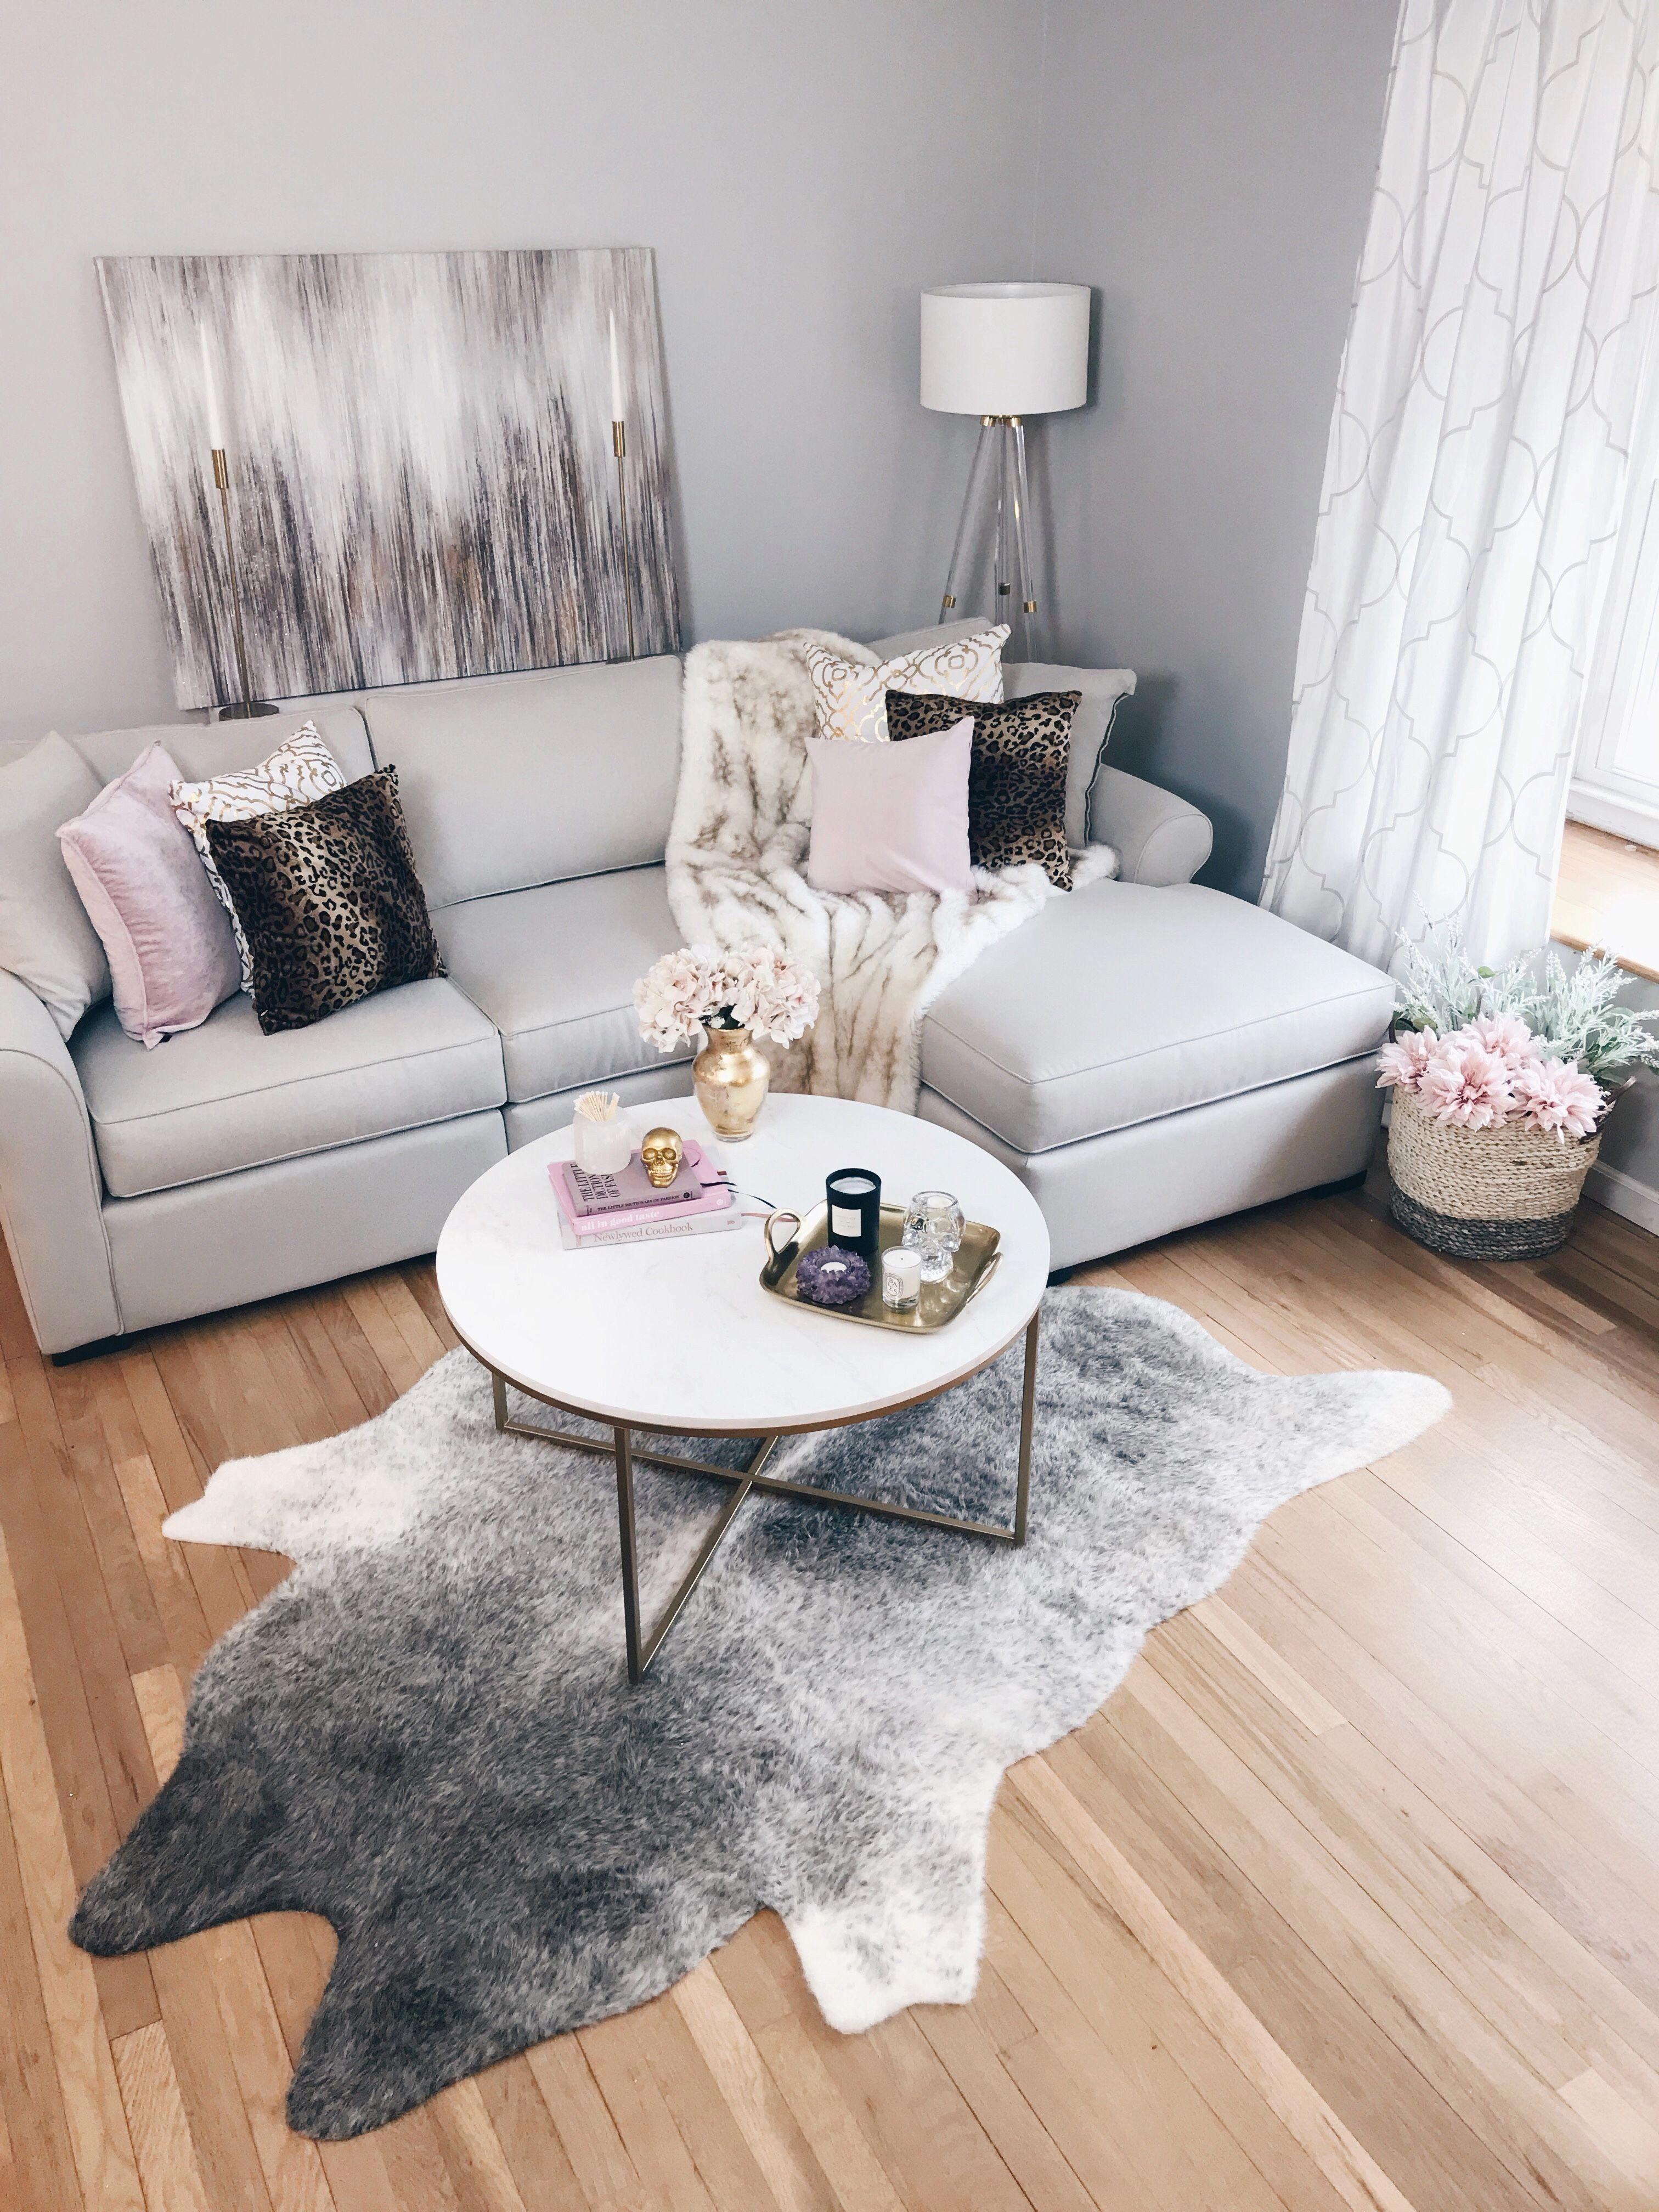 Sitting Room Decor Ideas Ideas To Decorate Your Living Room New Design Interior Living Room Contemporary Home Decor Home Decor Styles Home Decor